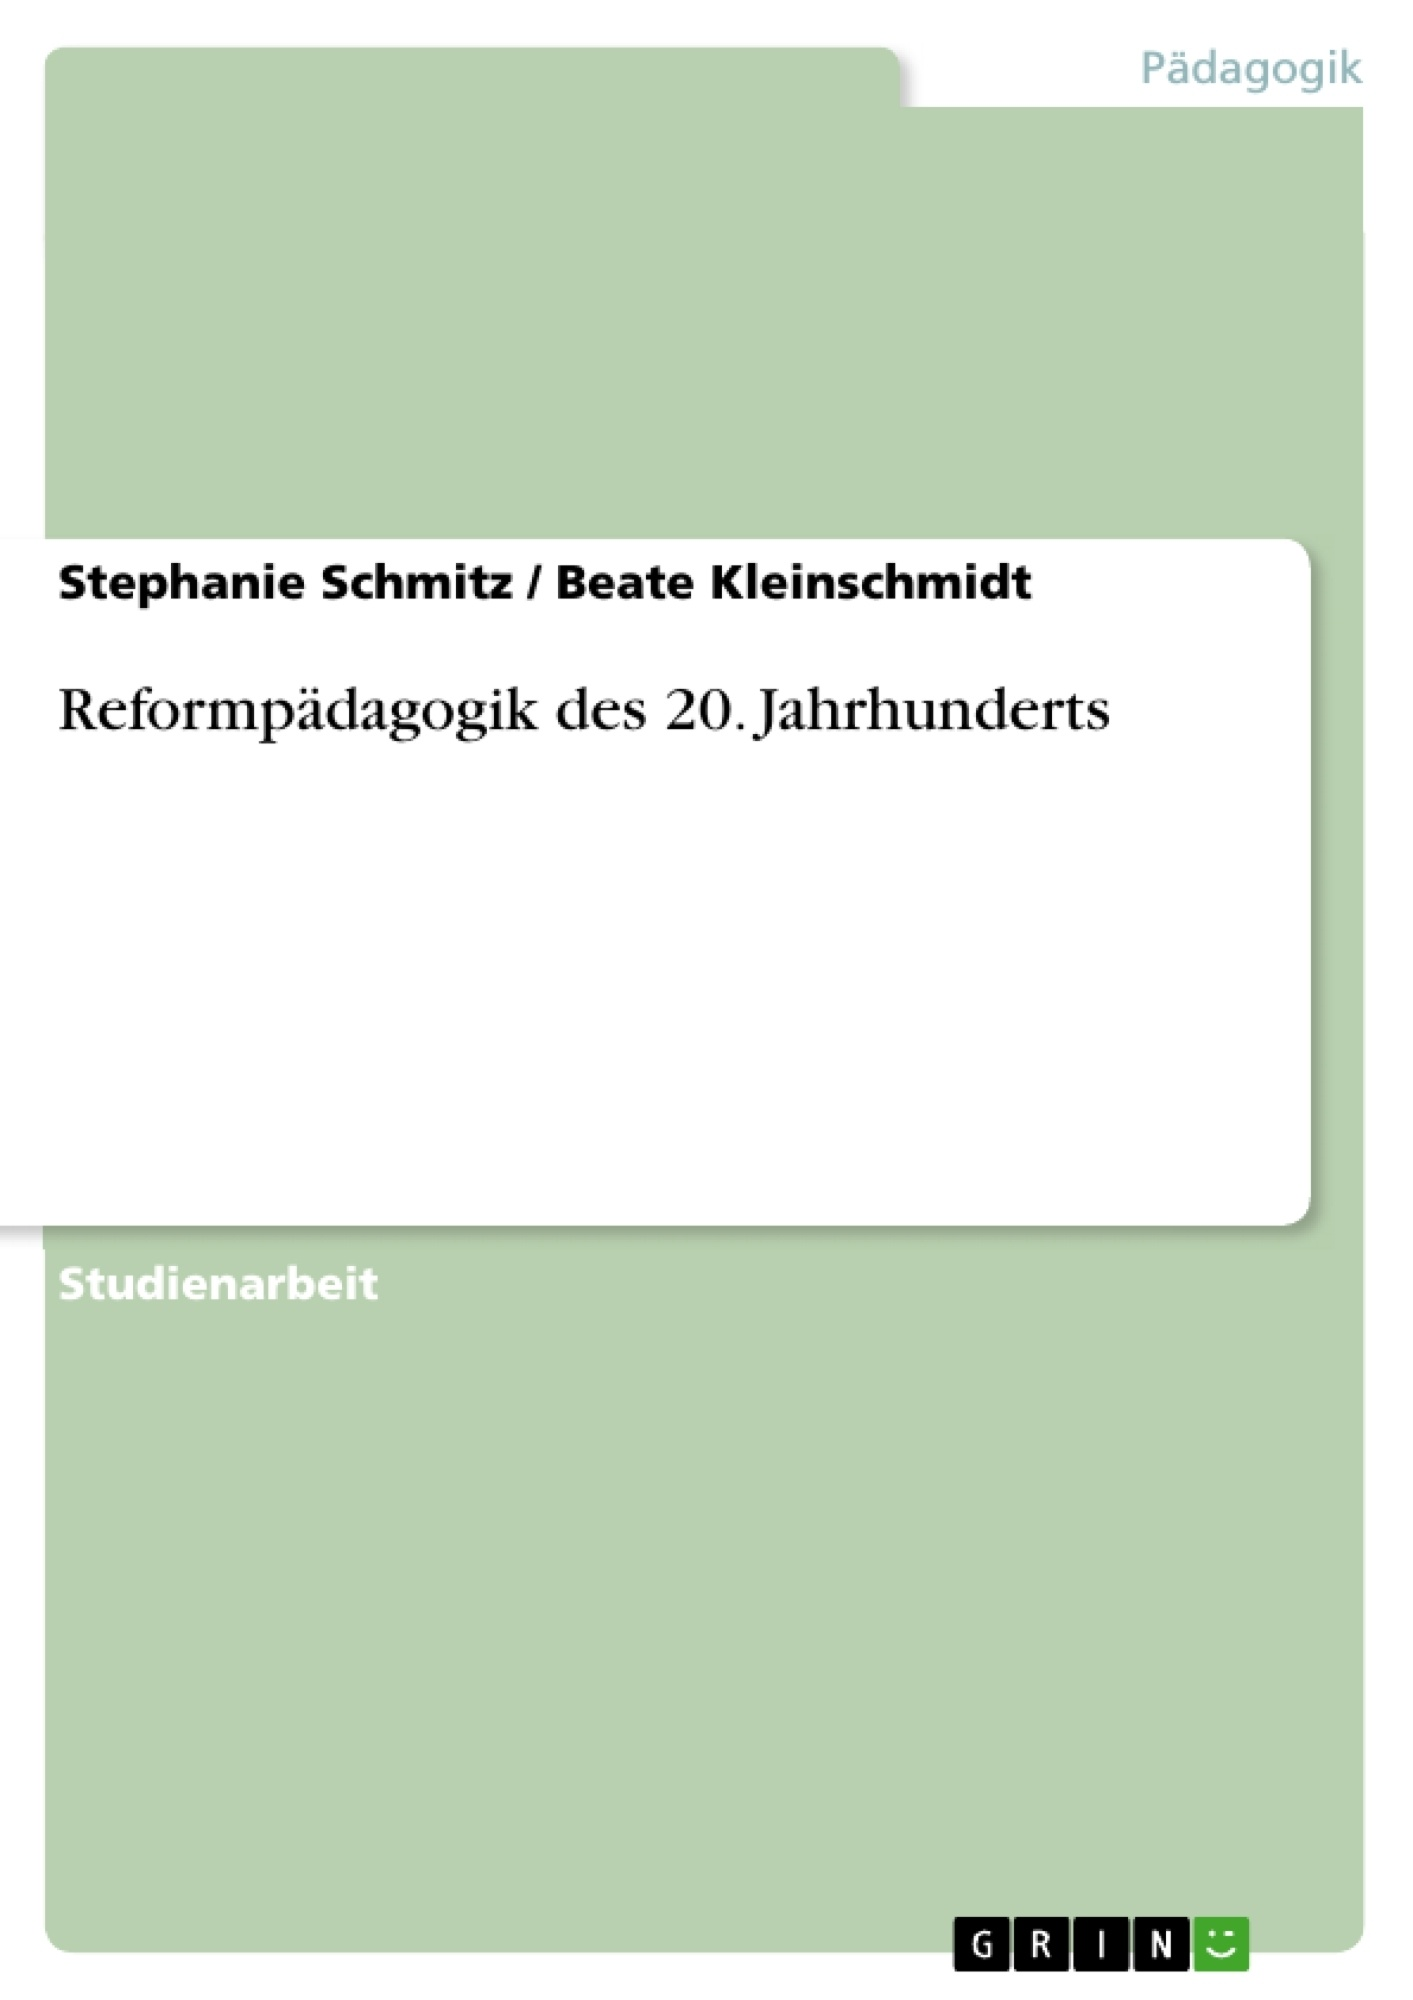 Titel: Reformpädagogik des 20. Jahrhunderts